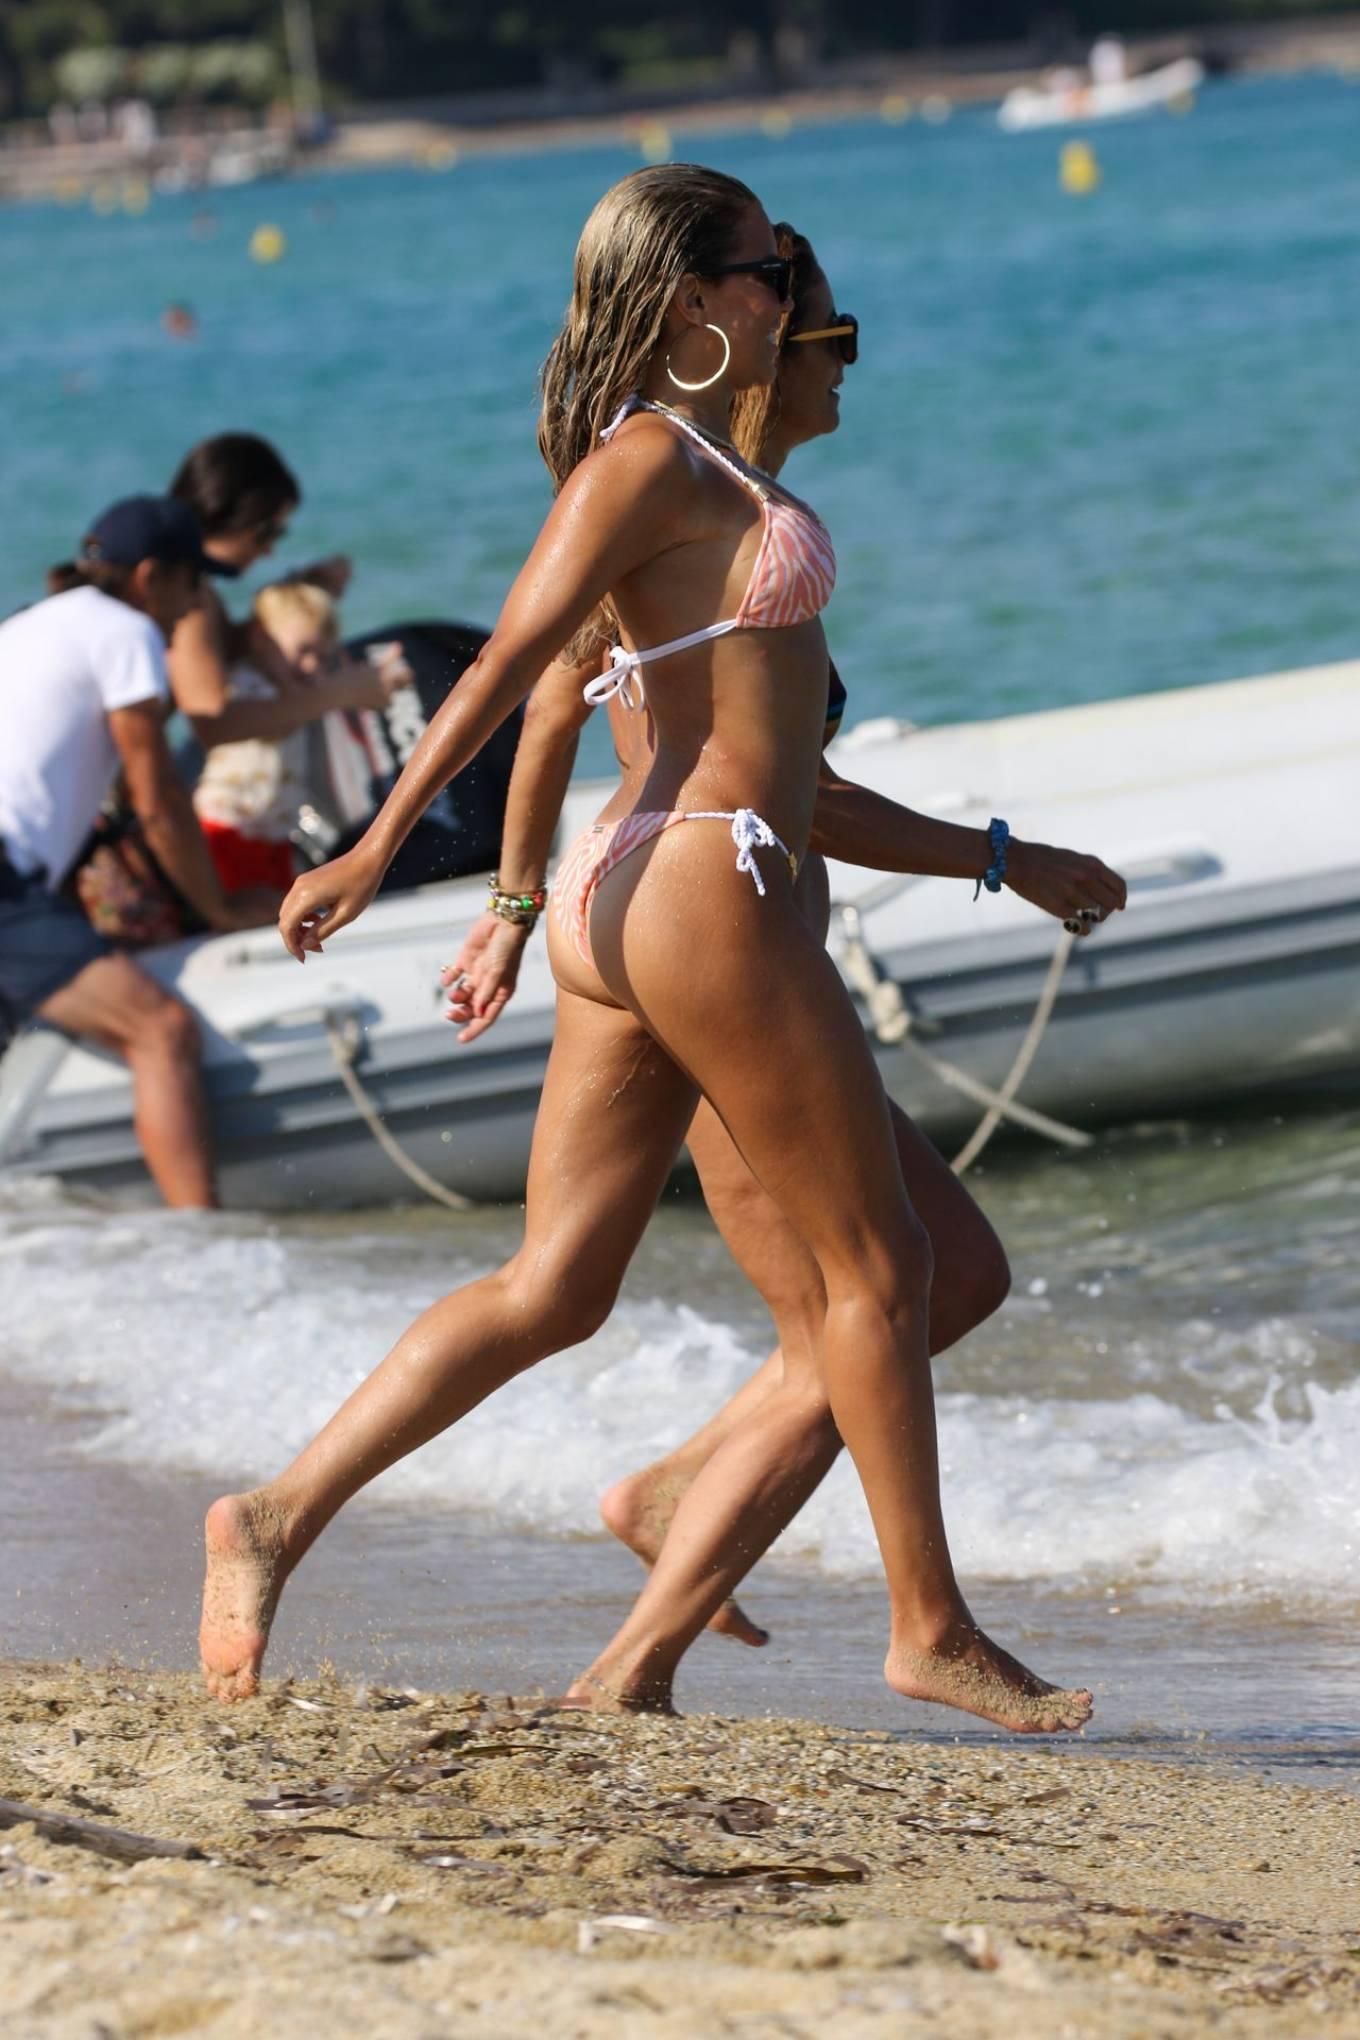 Sylvie Meis 2020 : Sylvie Meis in Bikini 2020-11